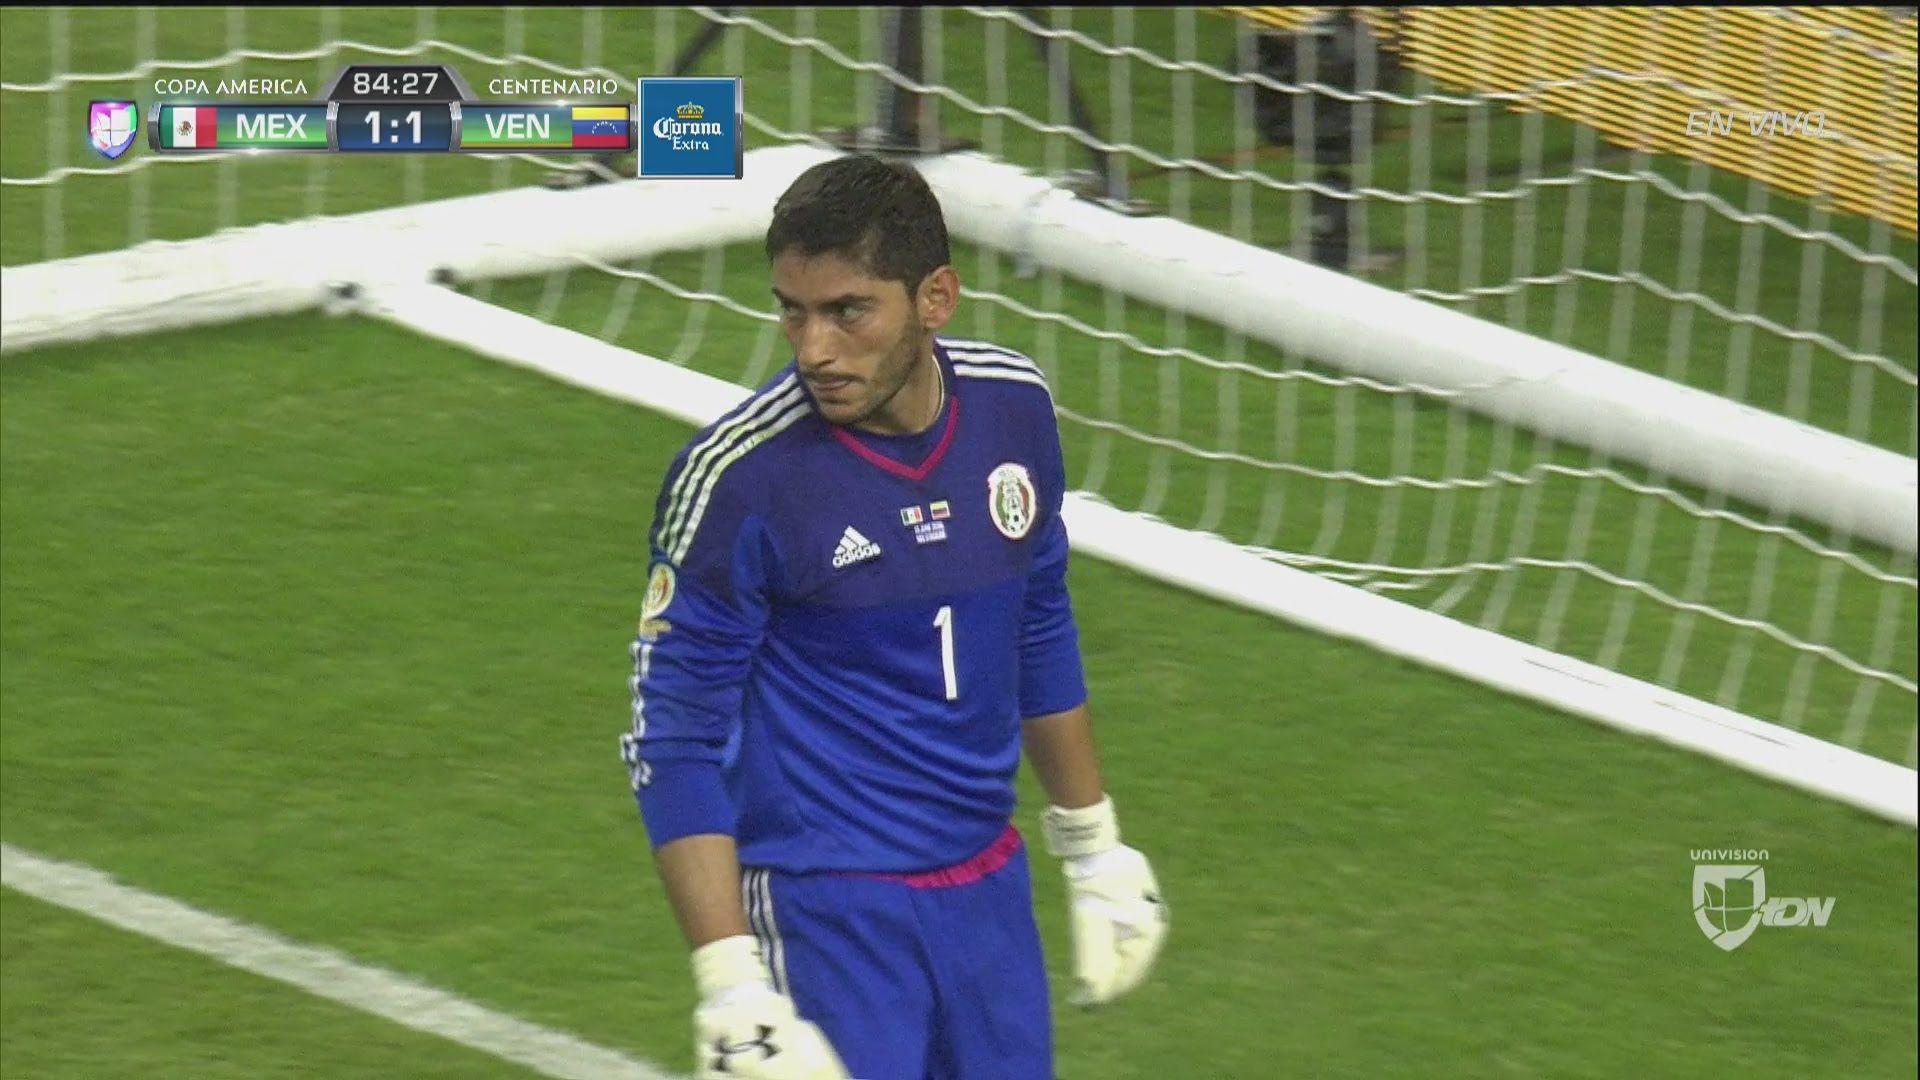 3c939ae5c Jesus Corona (Mexico) saves an overhead kick from Josef Martinez (Venezuela)